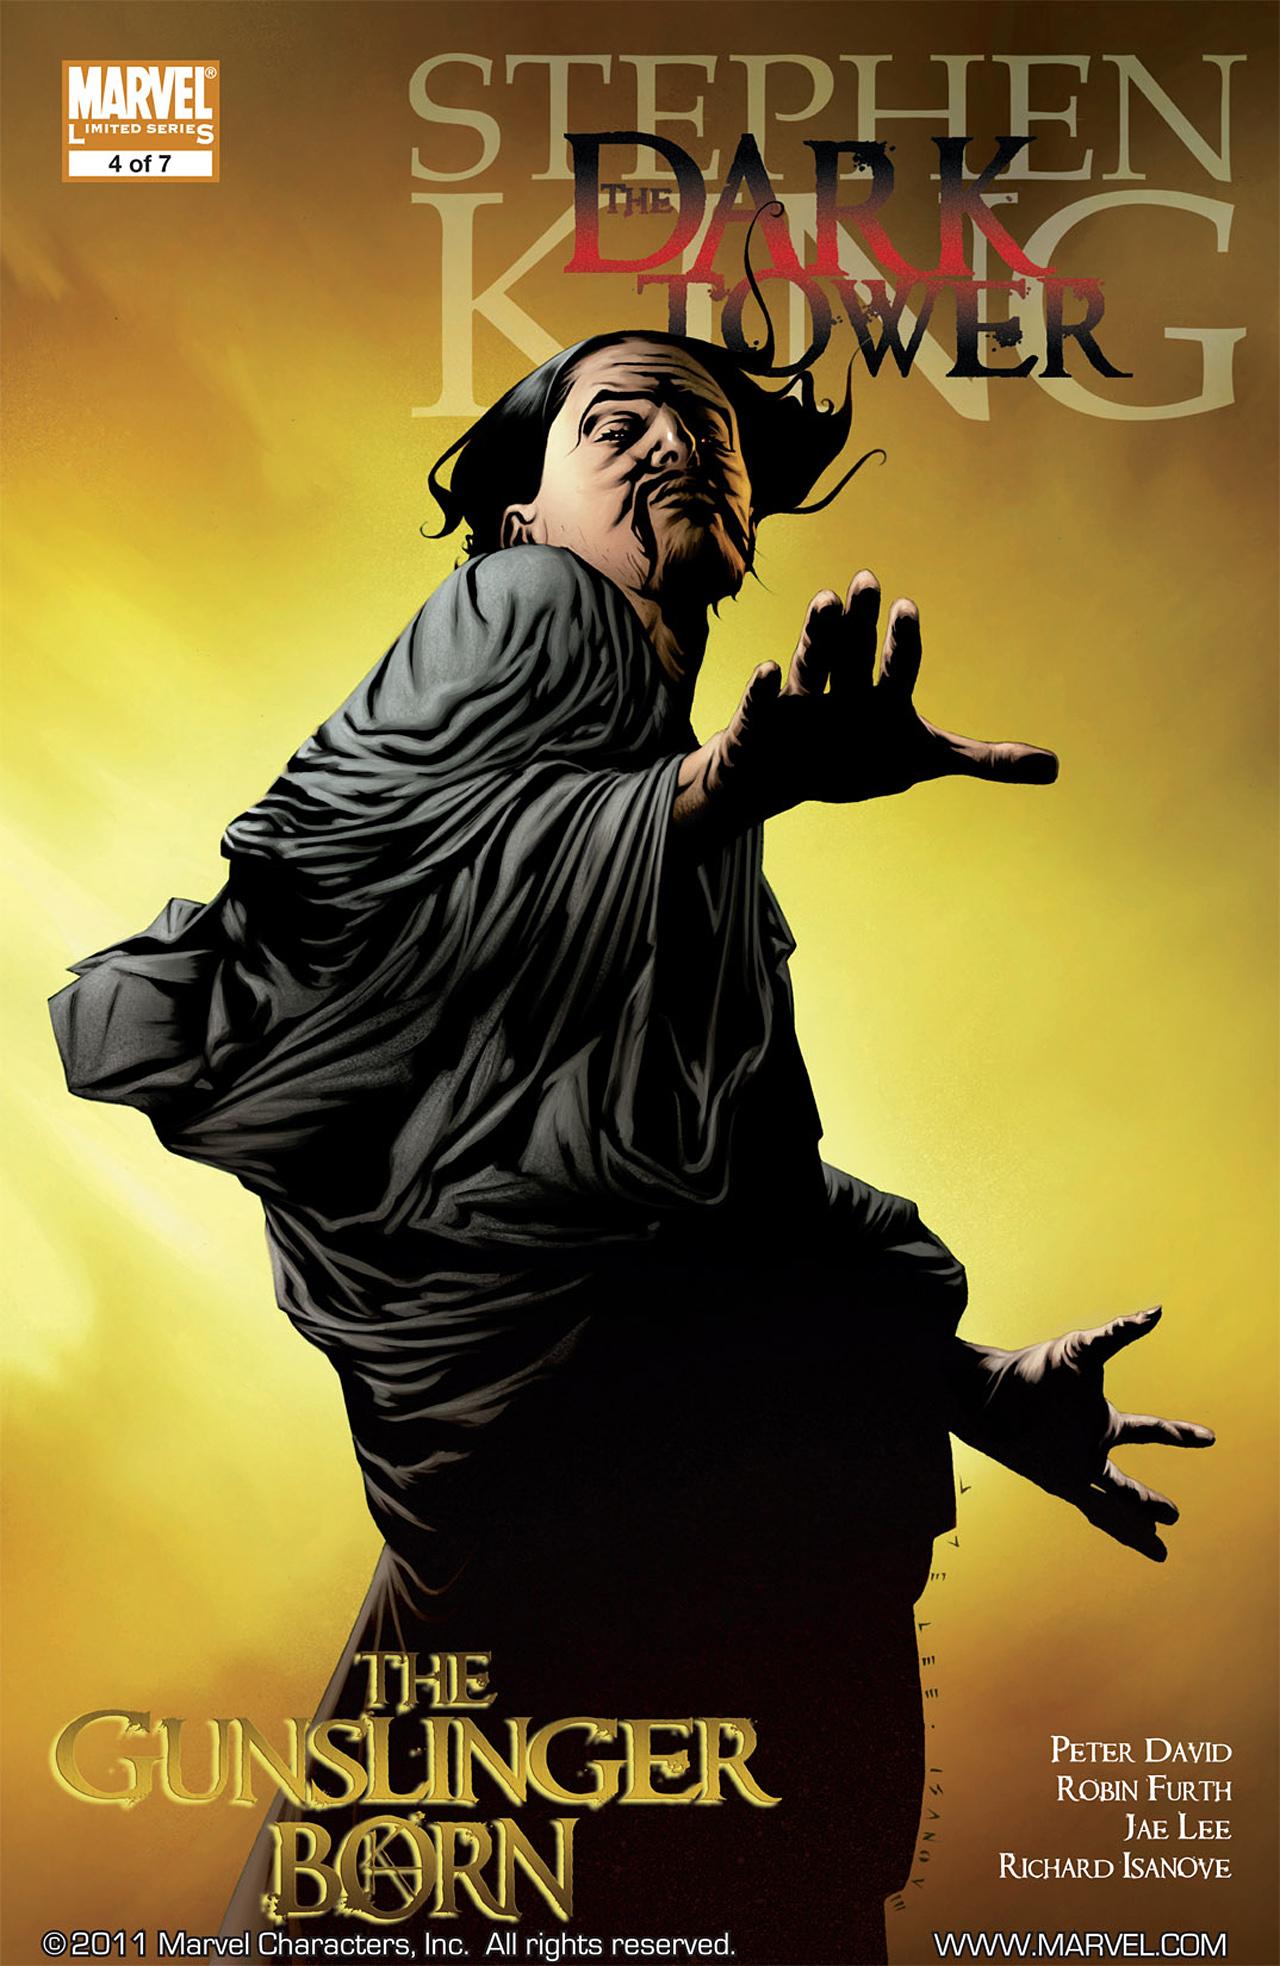 Dark Tower: The Gunslinger Born 4 Page 1